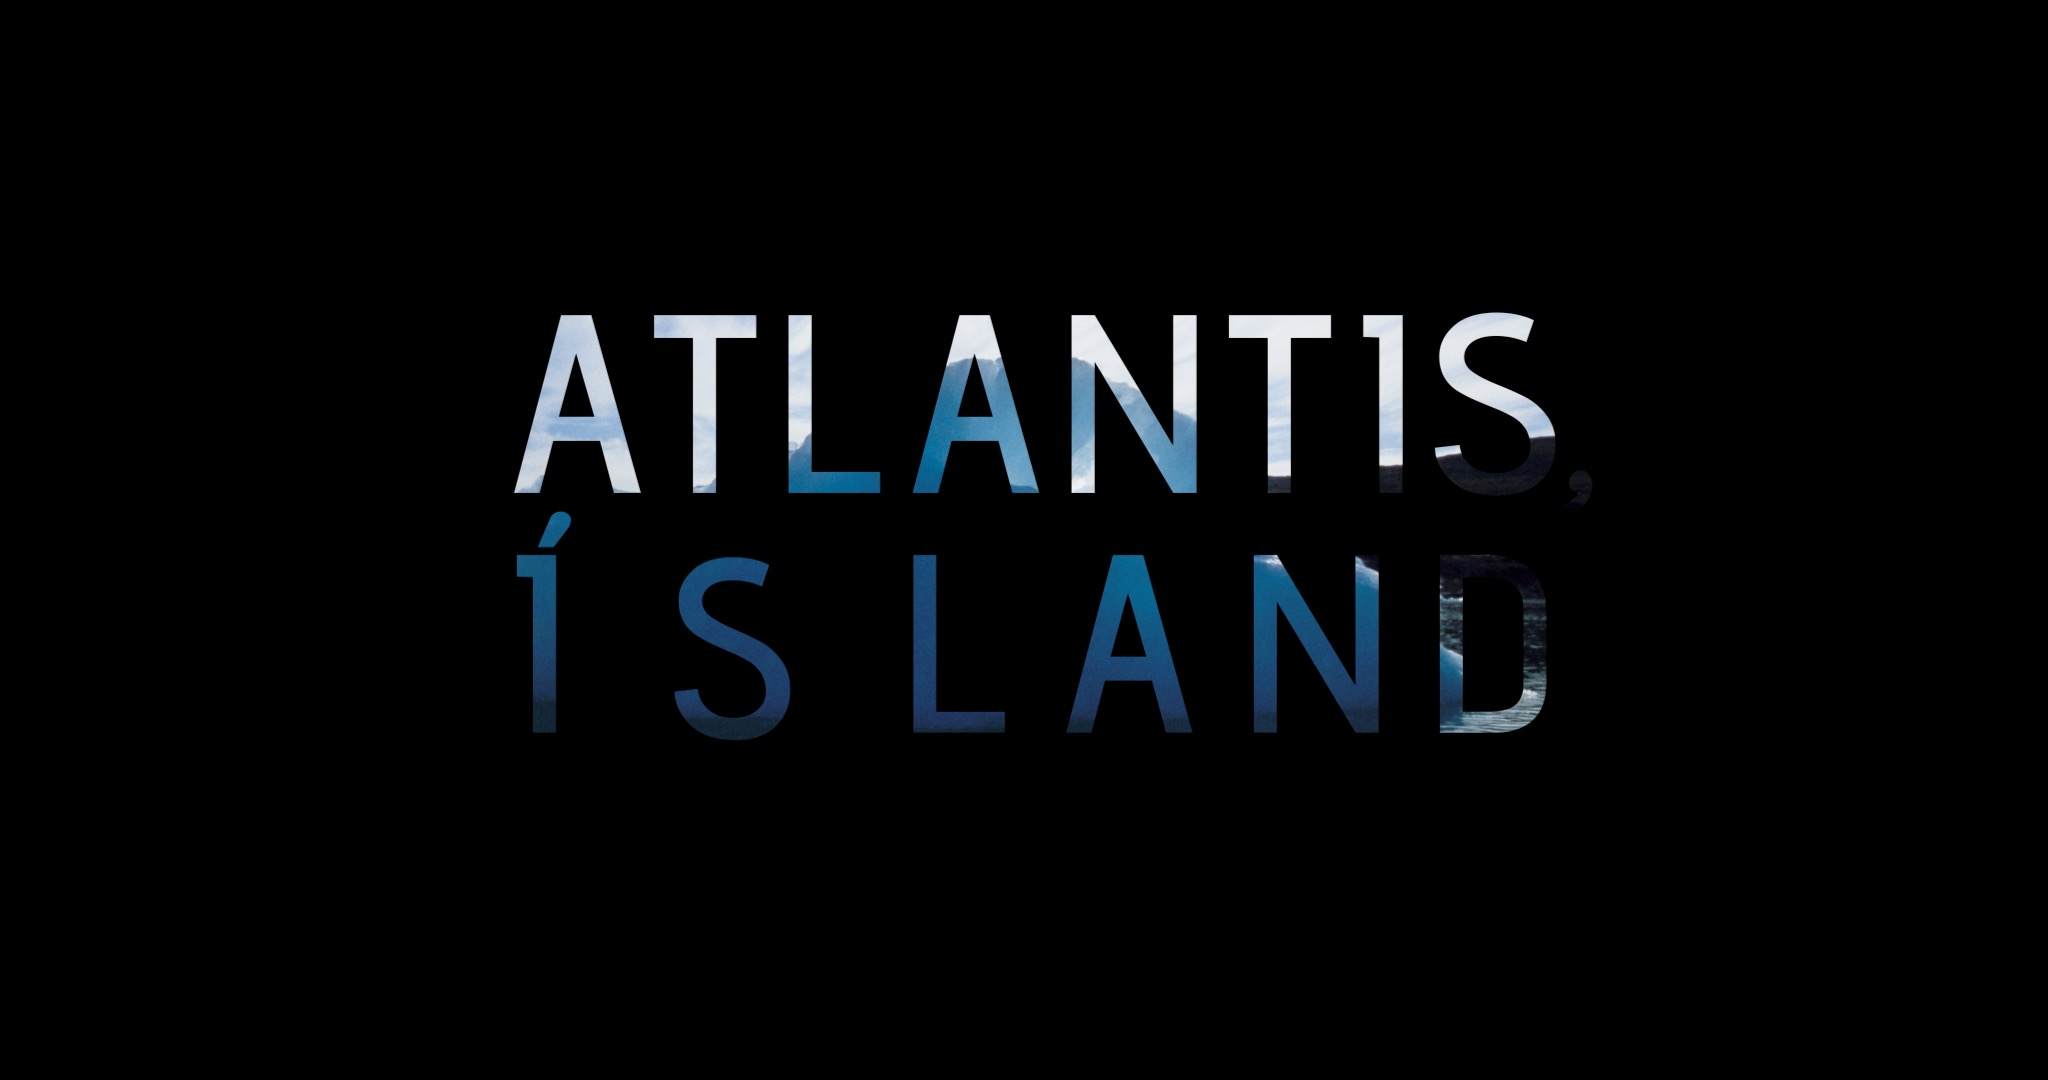 Atlantis, Ísland